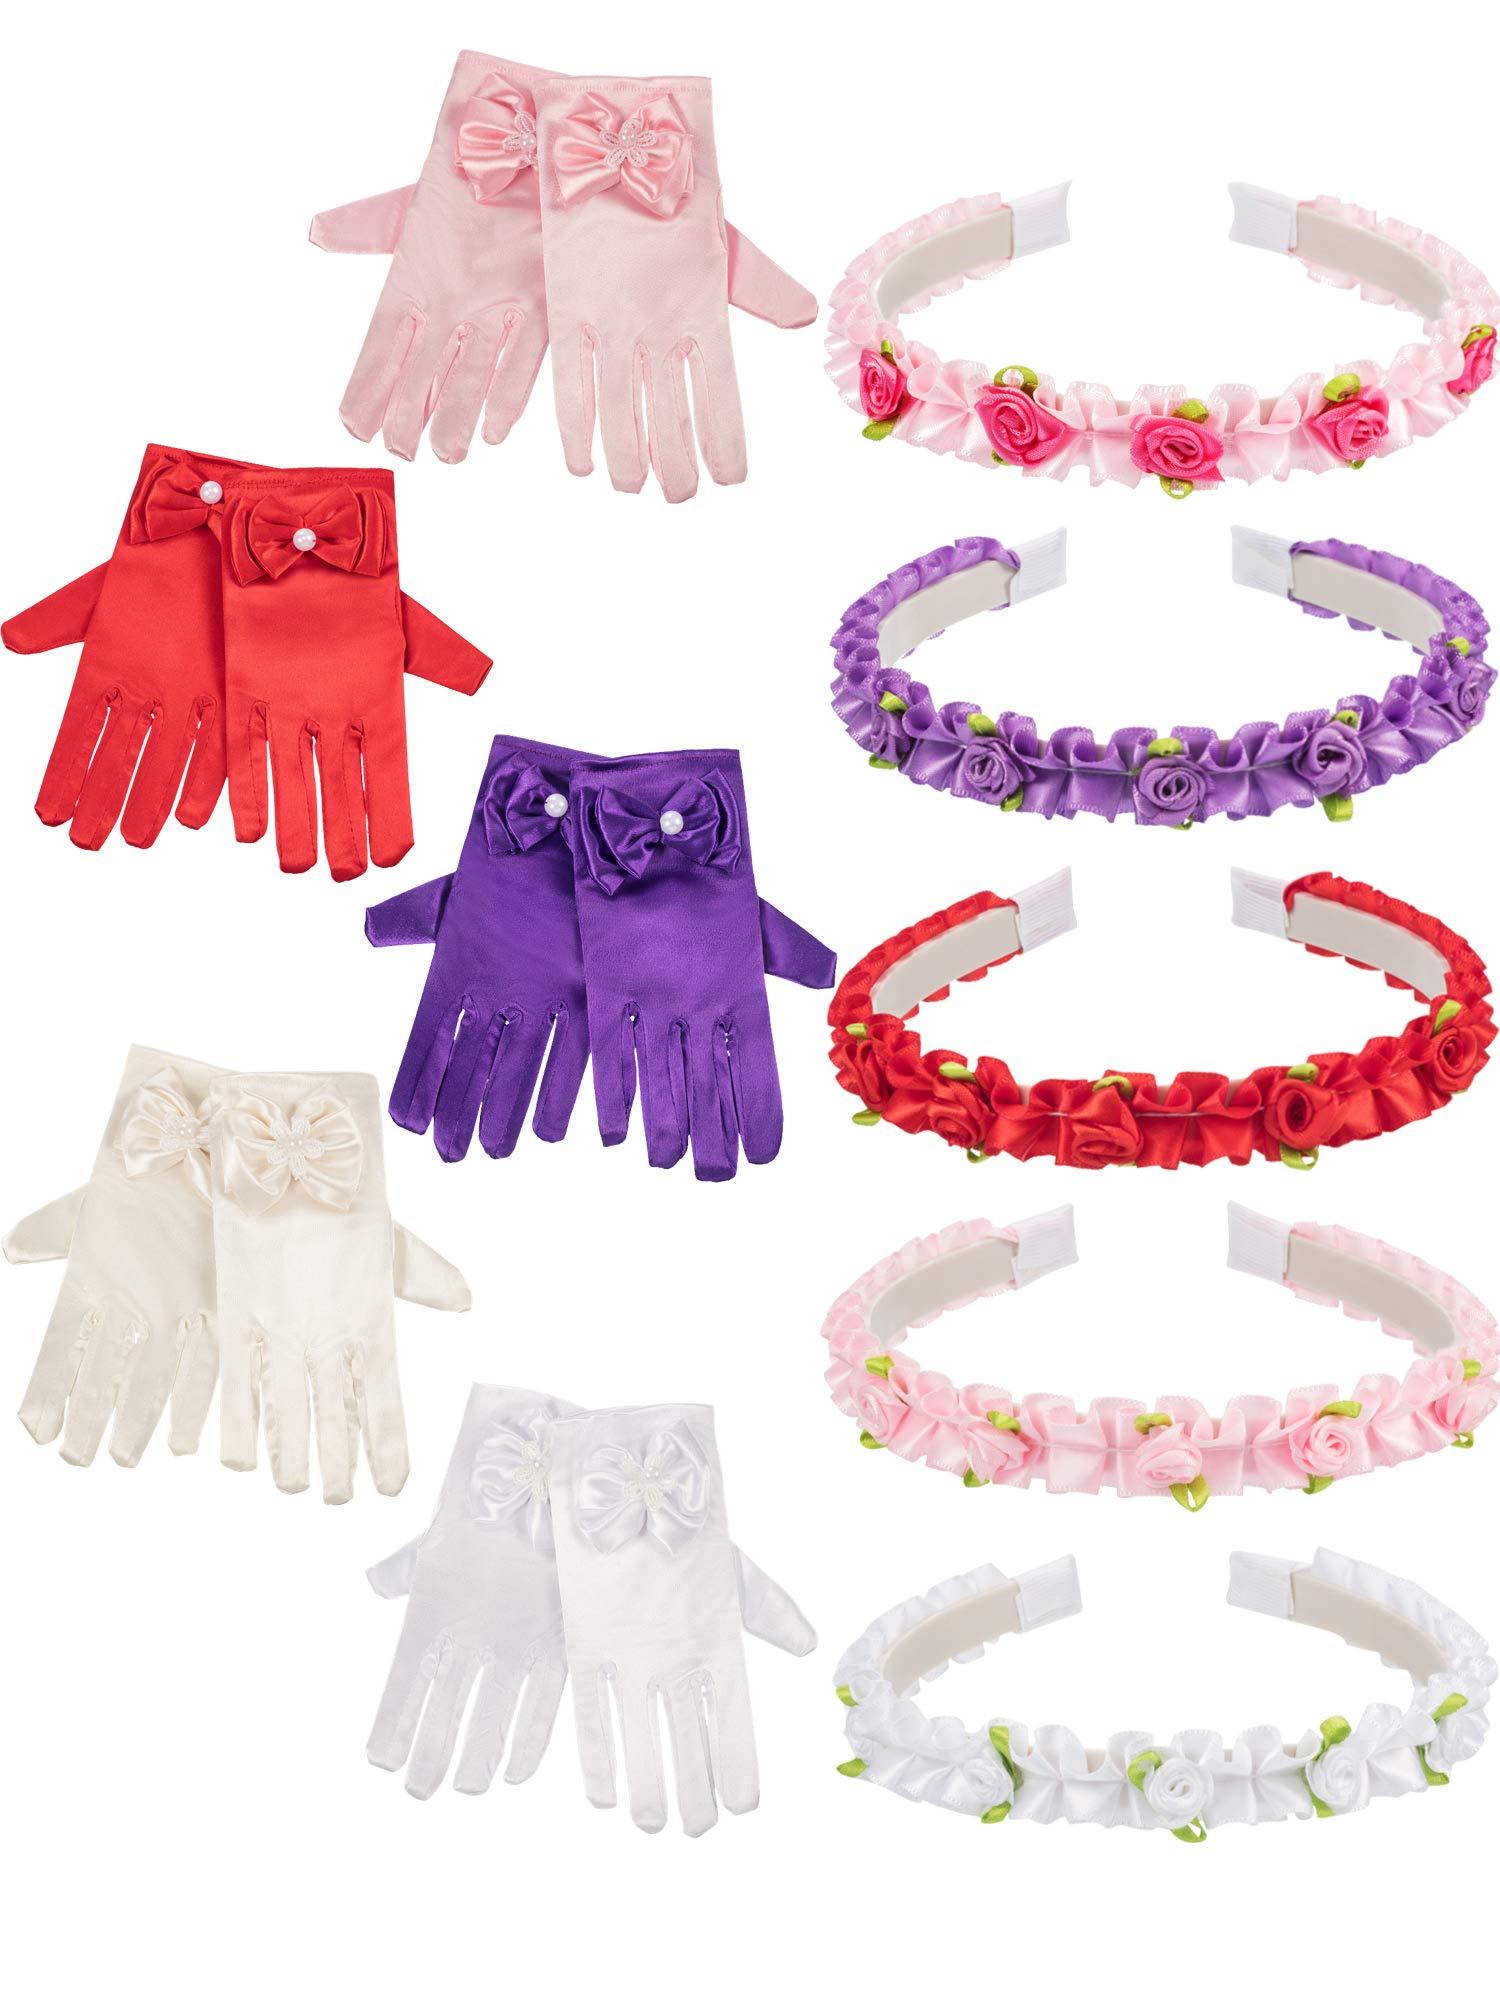 Zhanmai 5 Pairs Girls Satin Fancy Princess Dress up Gloves and Headband Headpiece by Zhanmai